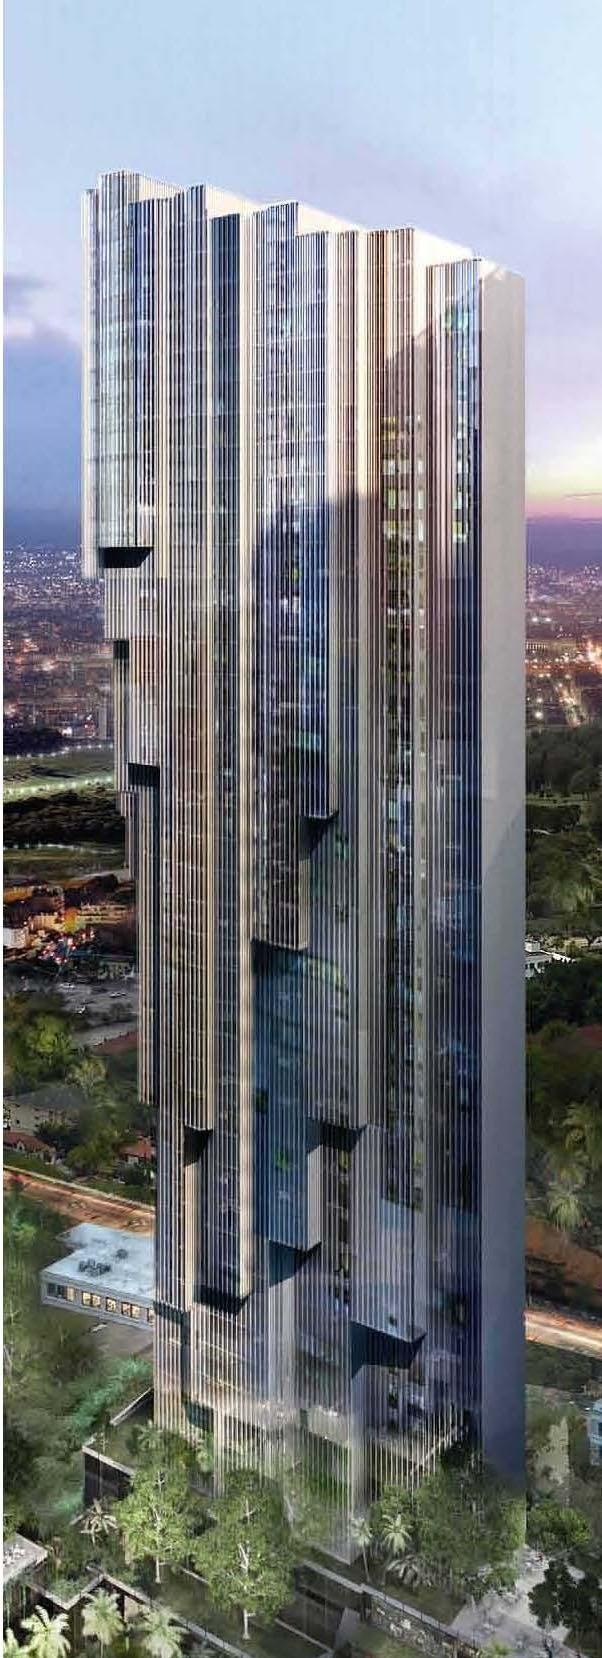 Platinum Residences, Platinum Park development, Kuala Lumpur by RSP Engineers Sdn Bhd :: 30 floors